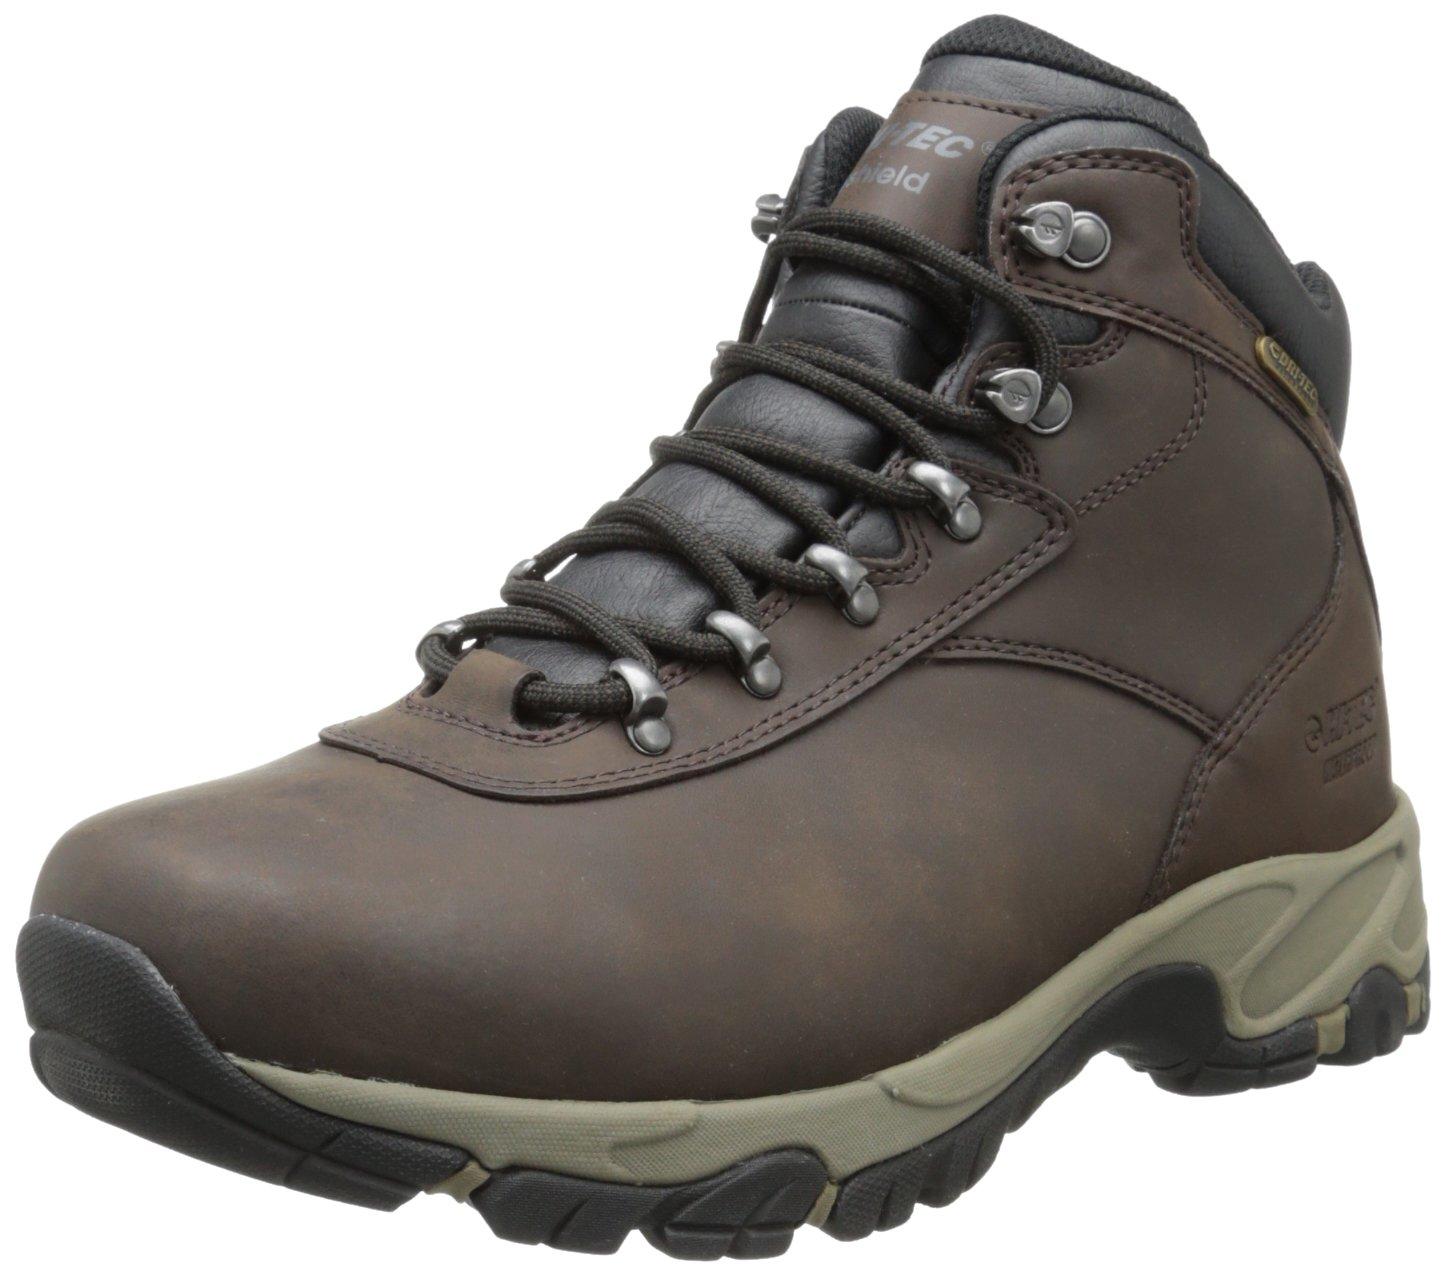 Hi-Tec Men's Altitude V I Waterproof Hiking Boot,Dark Chocolate/Dark Taupe/Black,11 M US